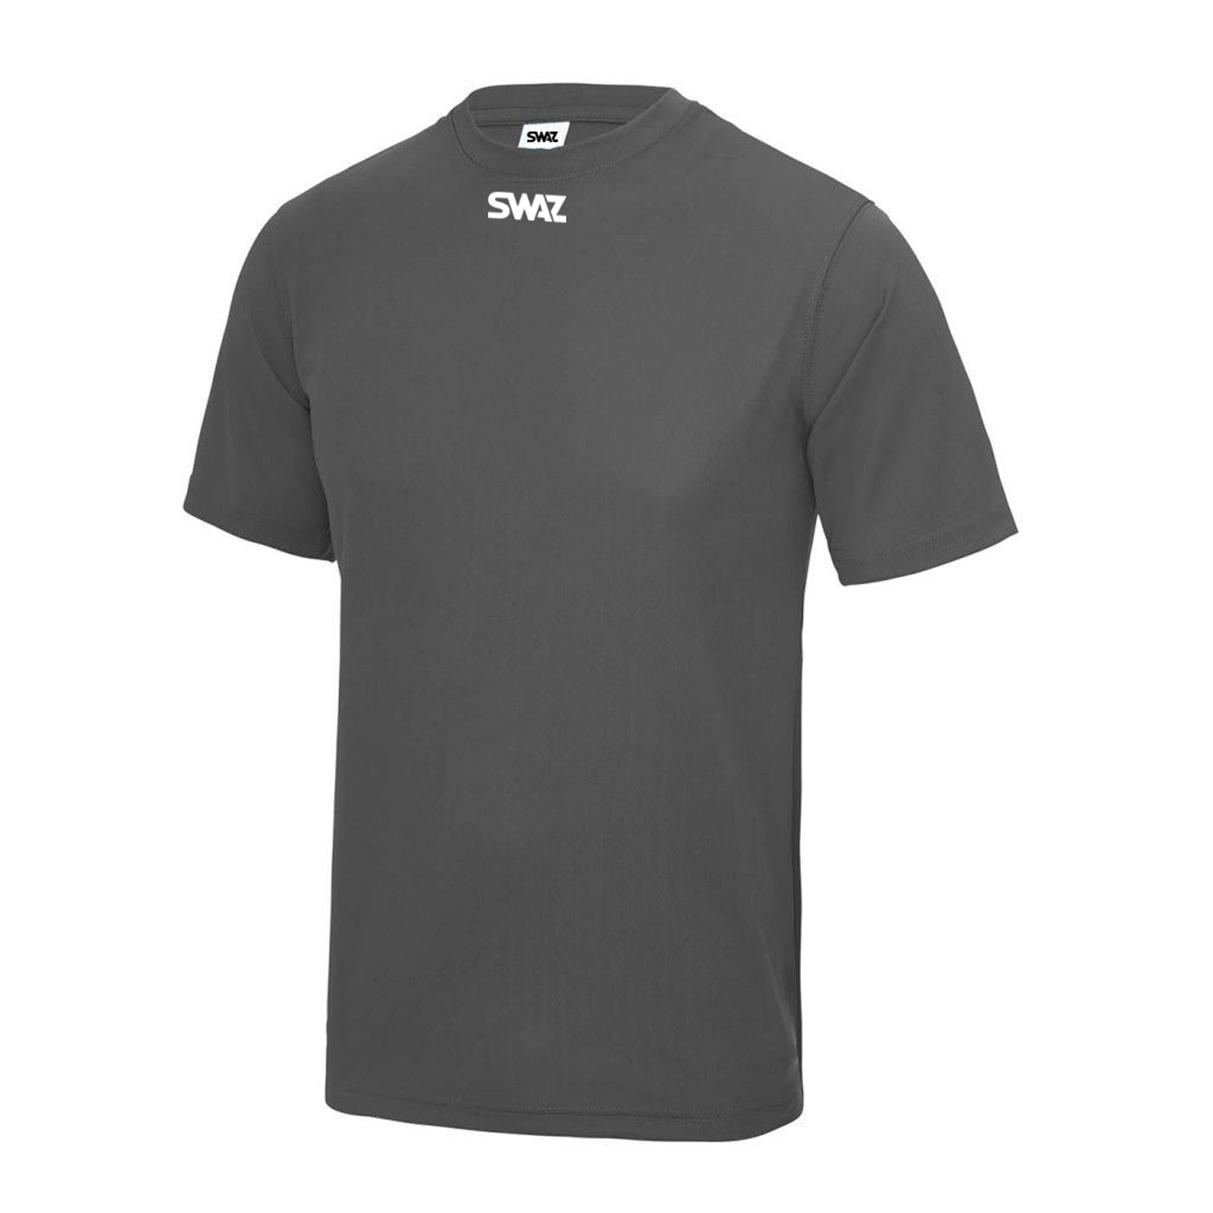 SWAZ Club Training T-Shirt – Charcoal